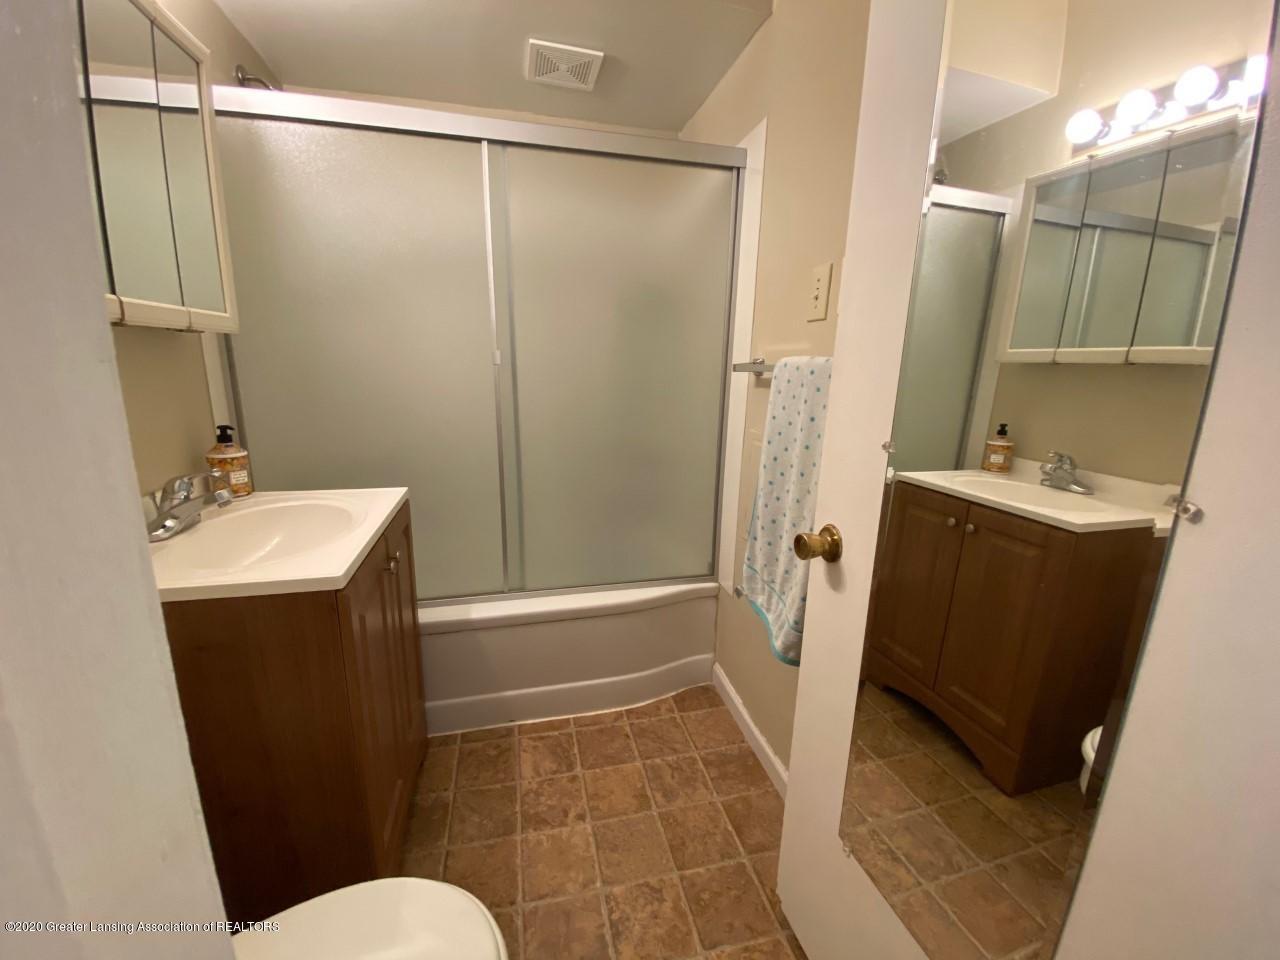 2847 Gramer Rd - Bathroom - 20